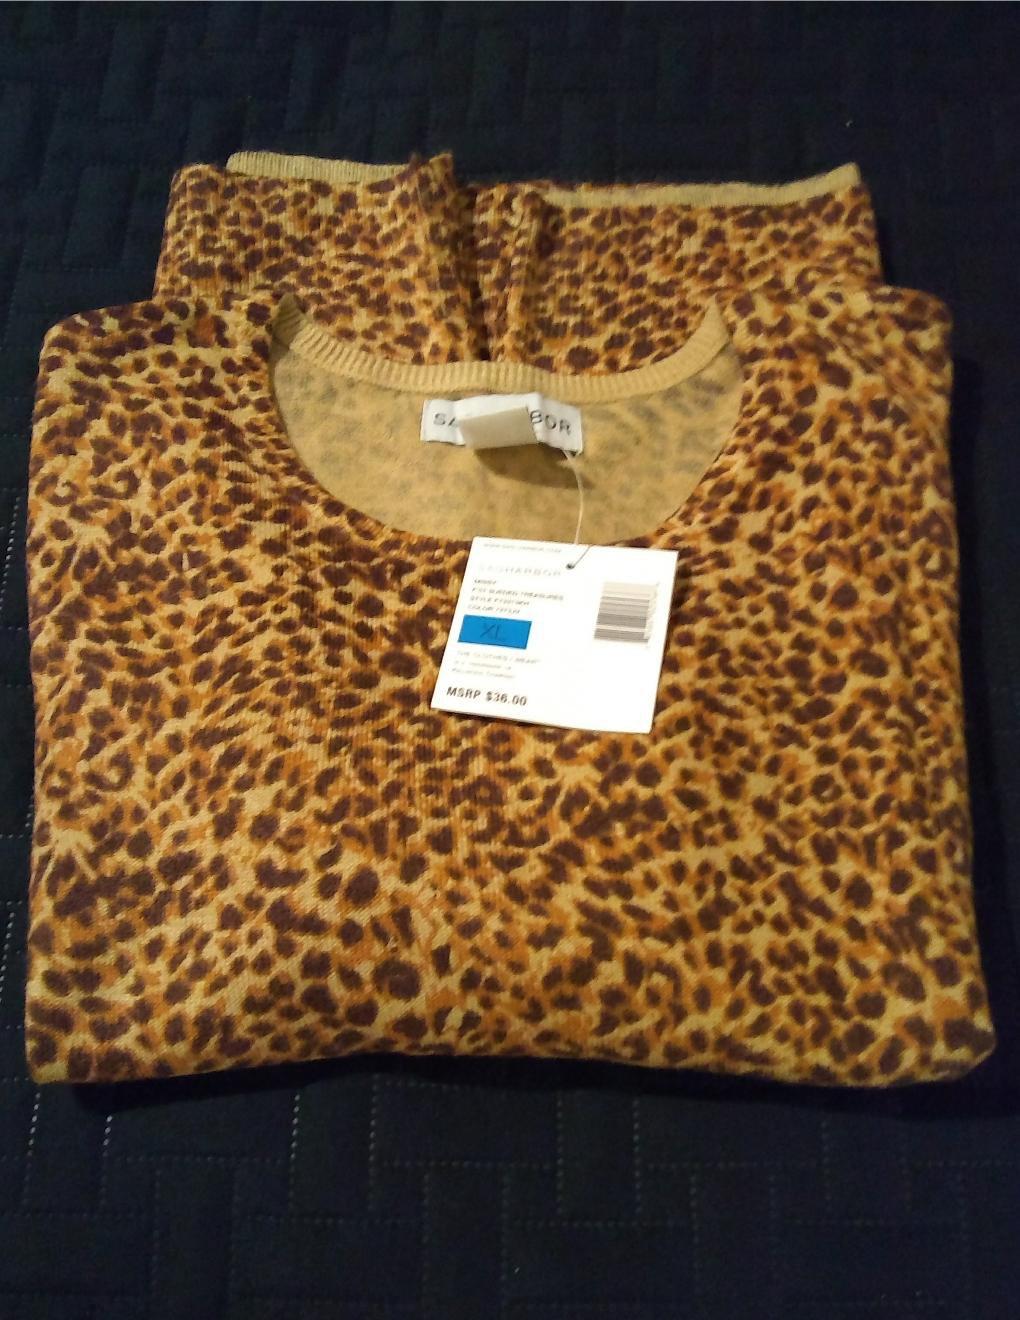 Sag Harbor Sueded Treasures Animal Print Sweater Top Shirt Brown Tan Sz. Small NEW